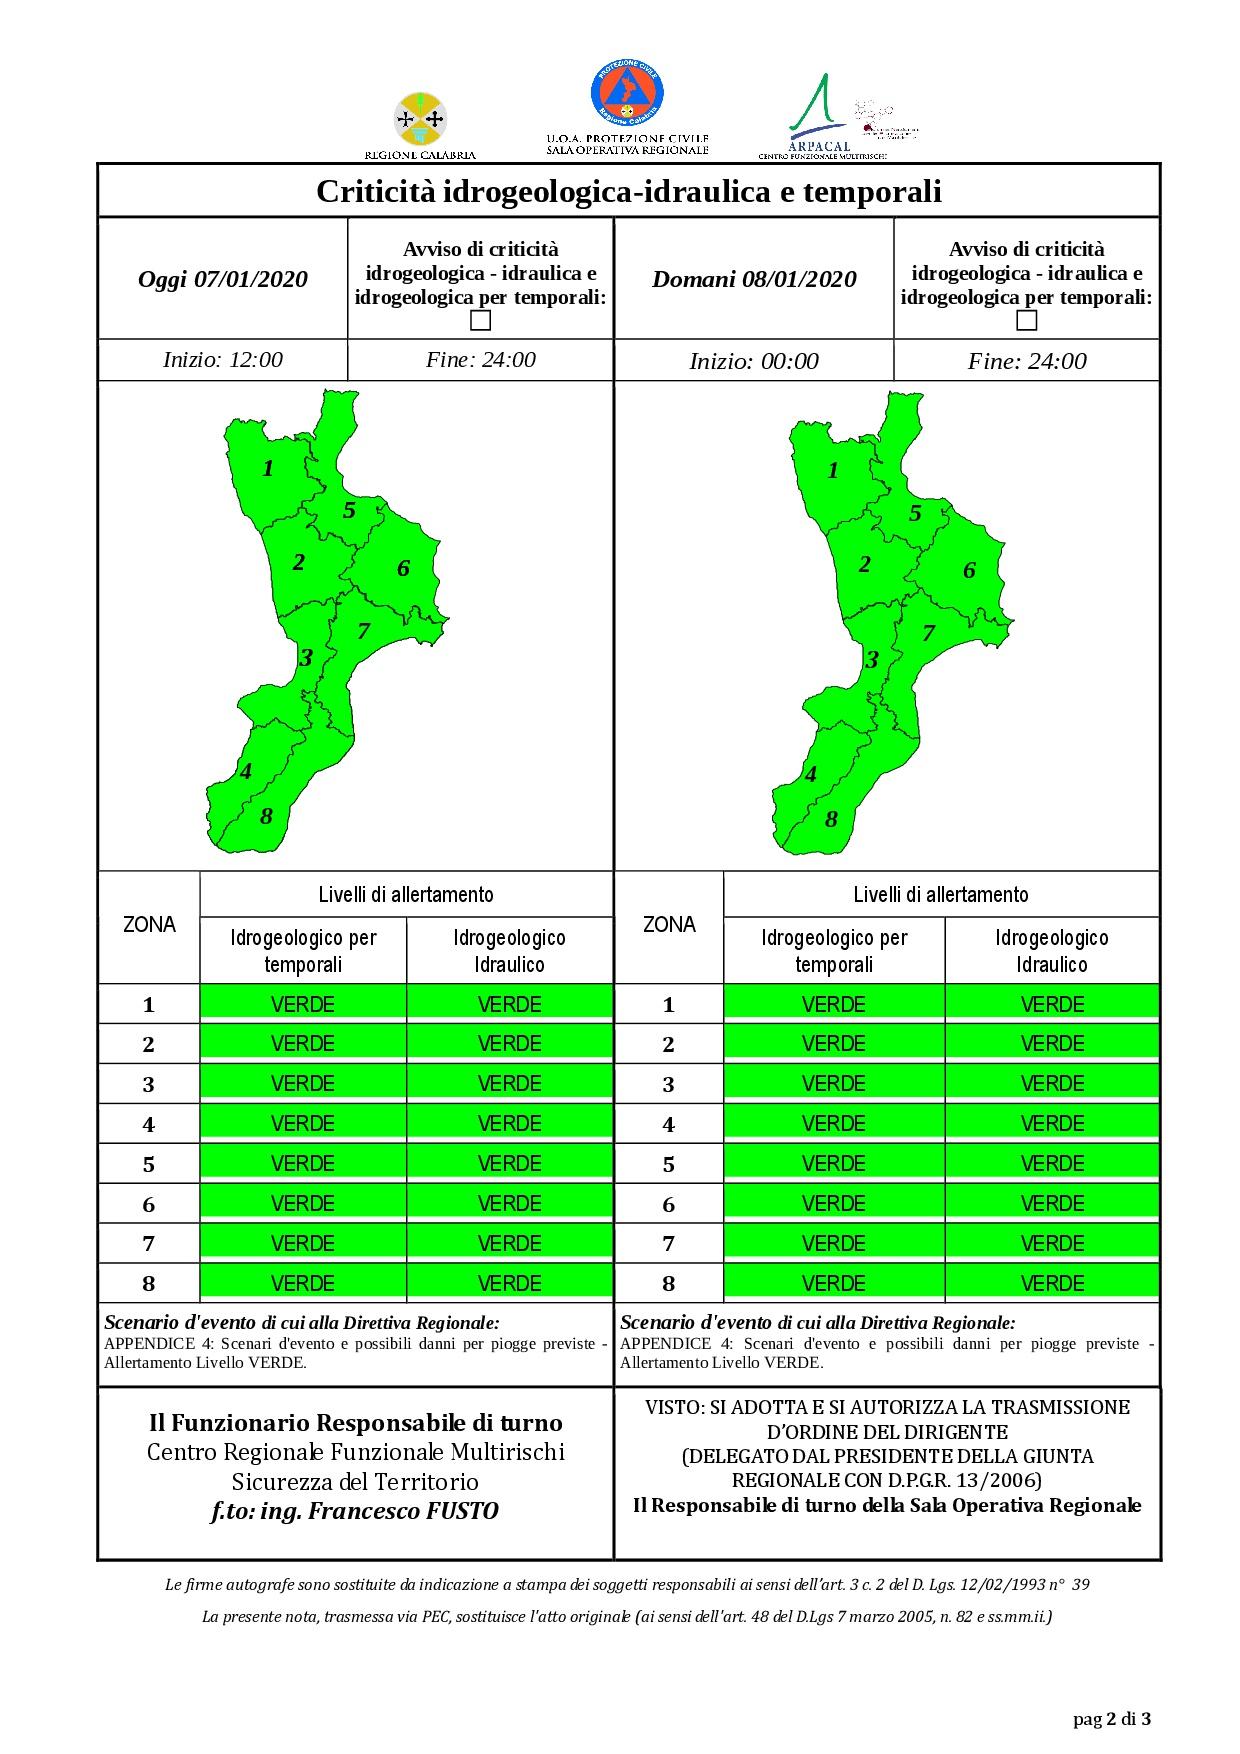 Criticità idrogeologica-idraulica e temporali in Calabria 07-01-2020